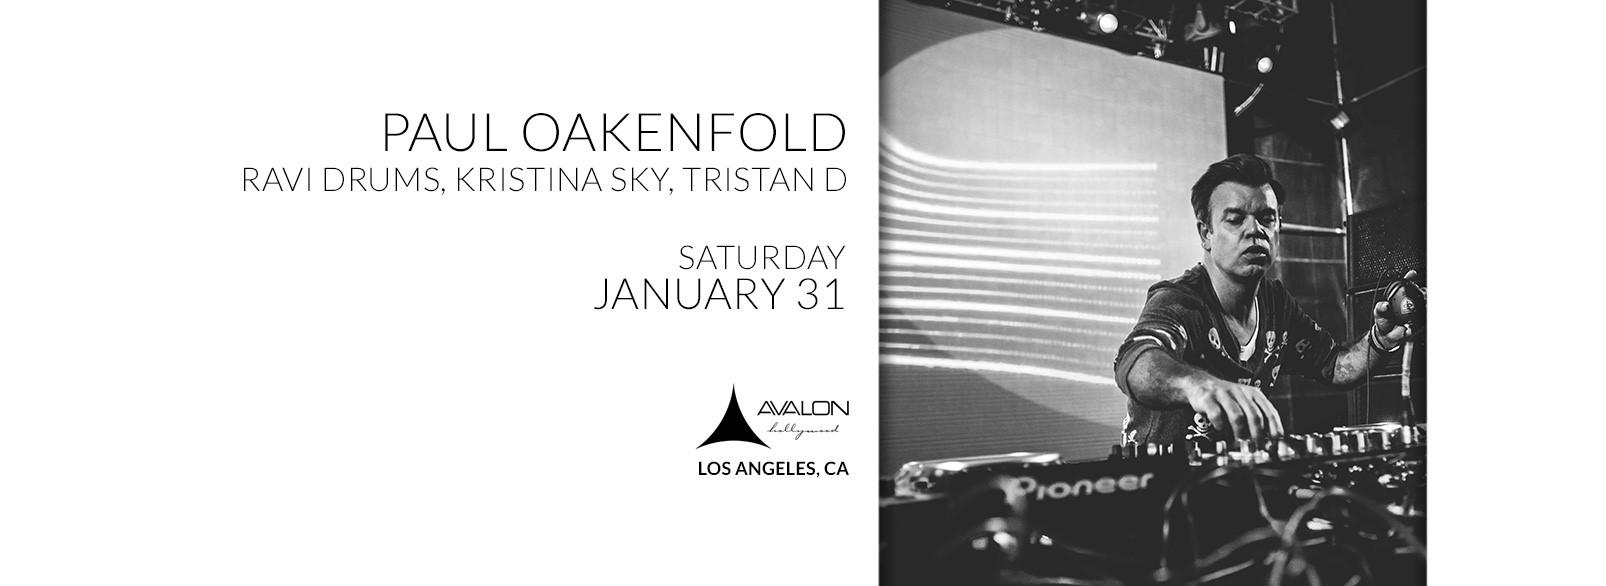 Paul Oakenfold @ Avalon Hollywood